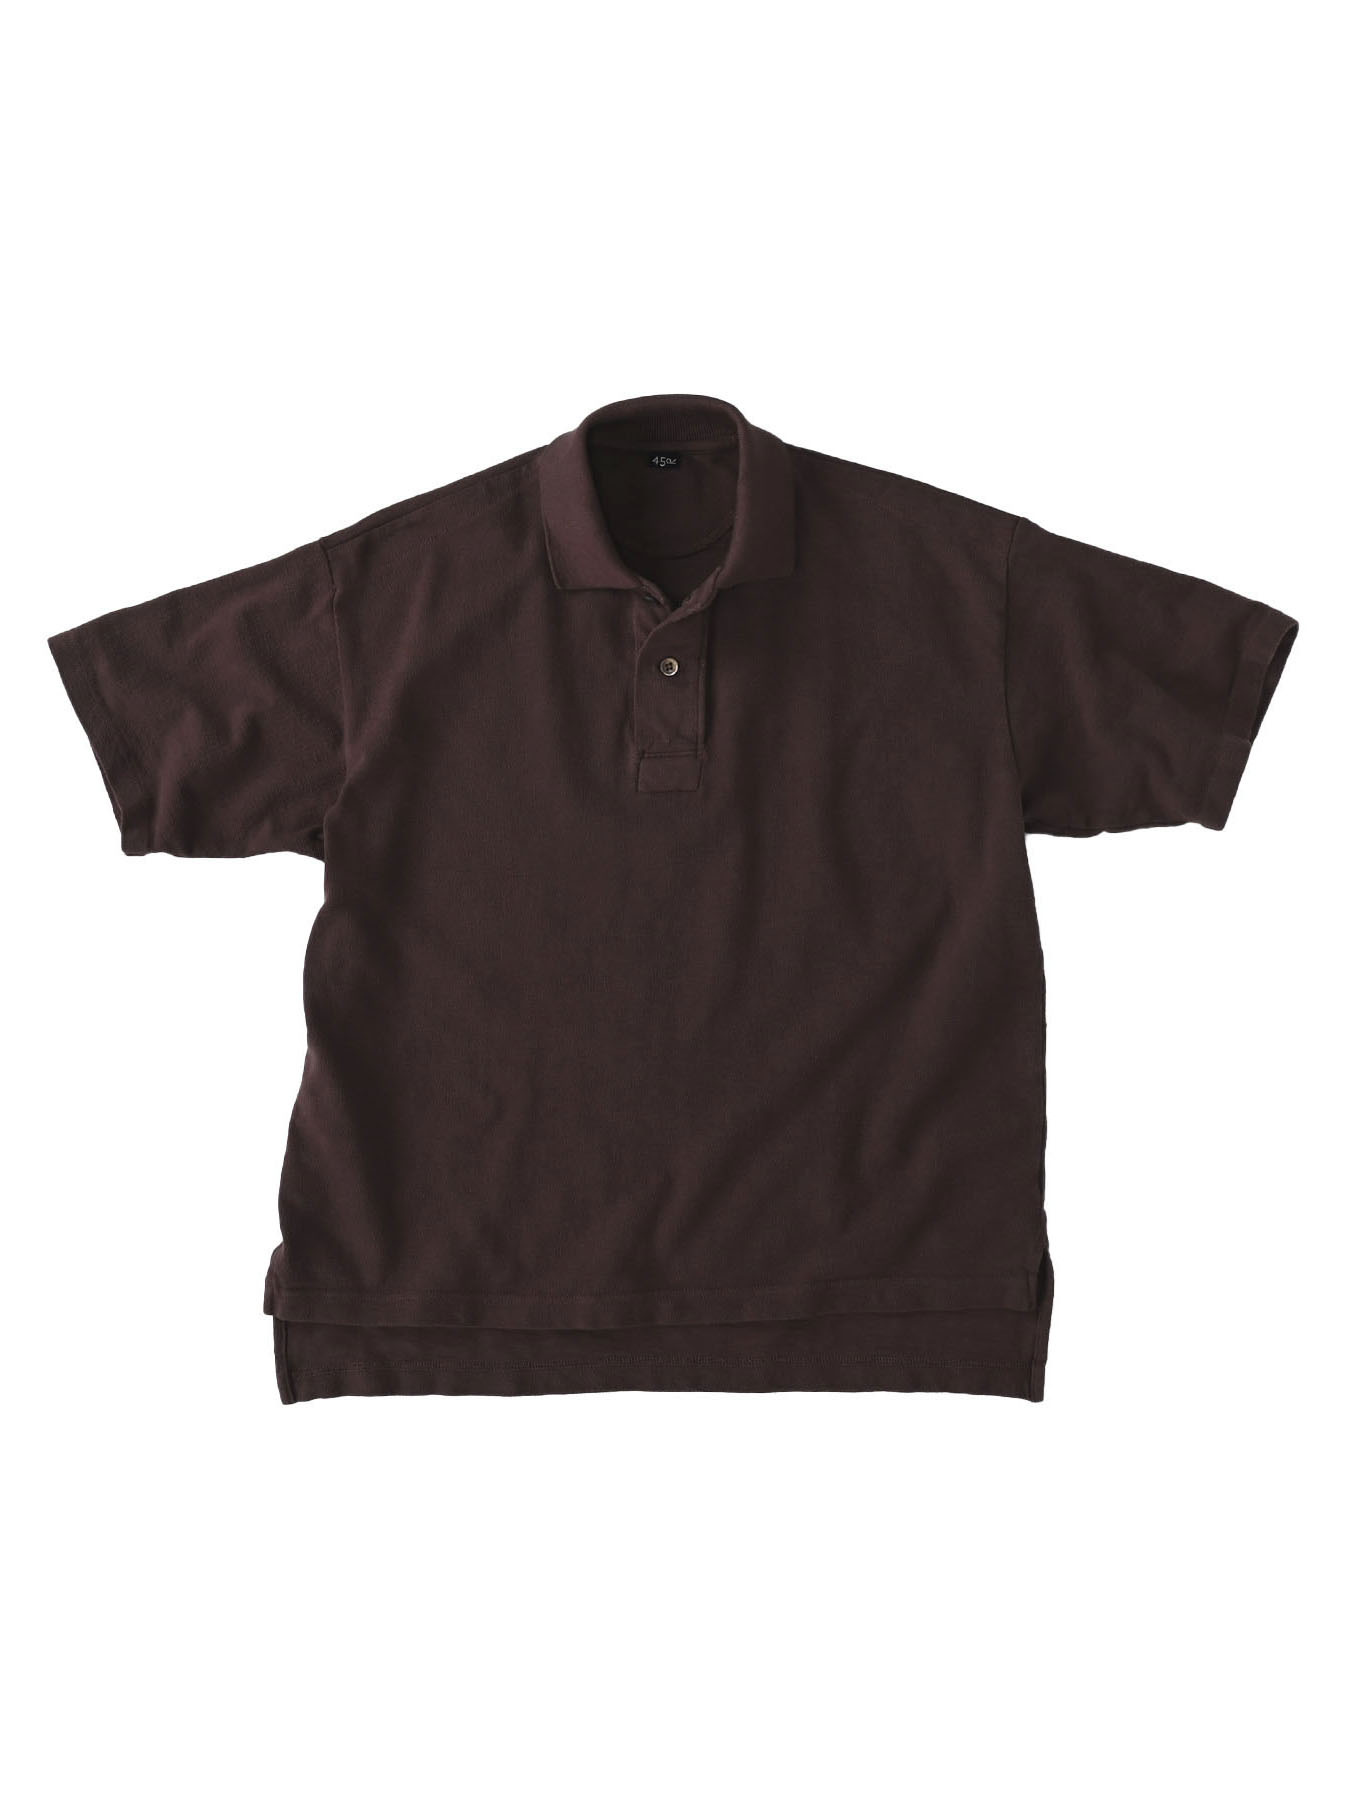 Kanoko Ocean Shiokaze Short-sleeved Polo Shirt (0521)-2